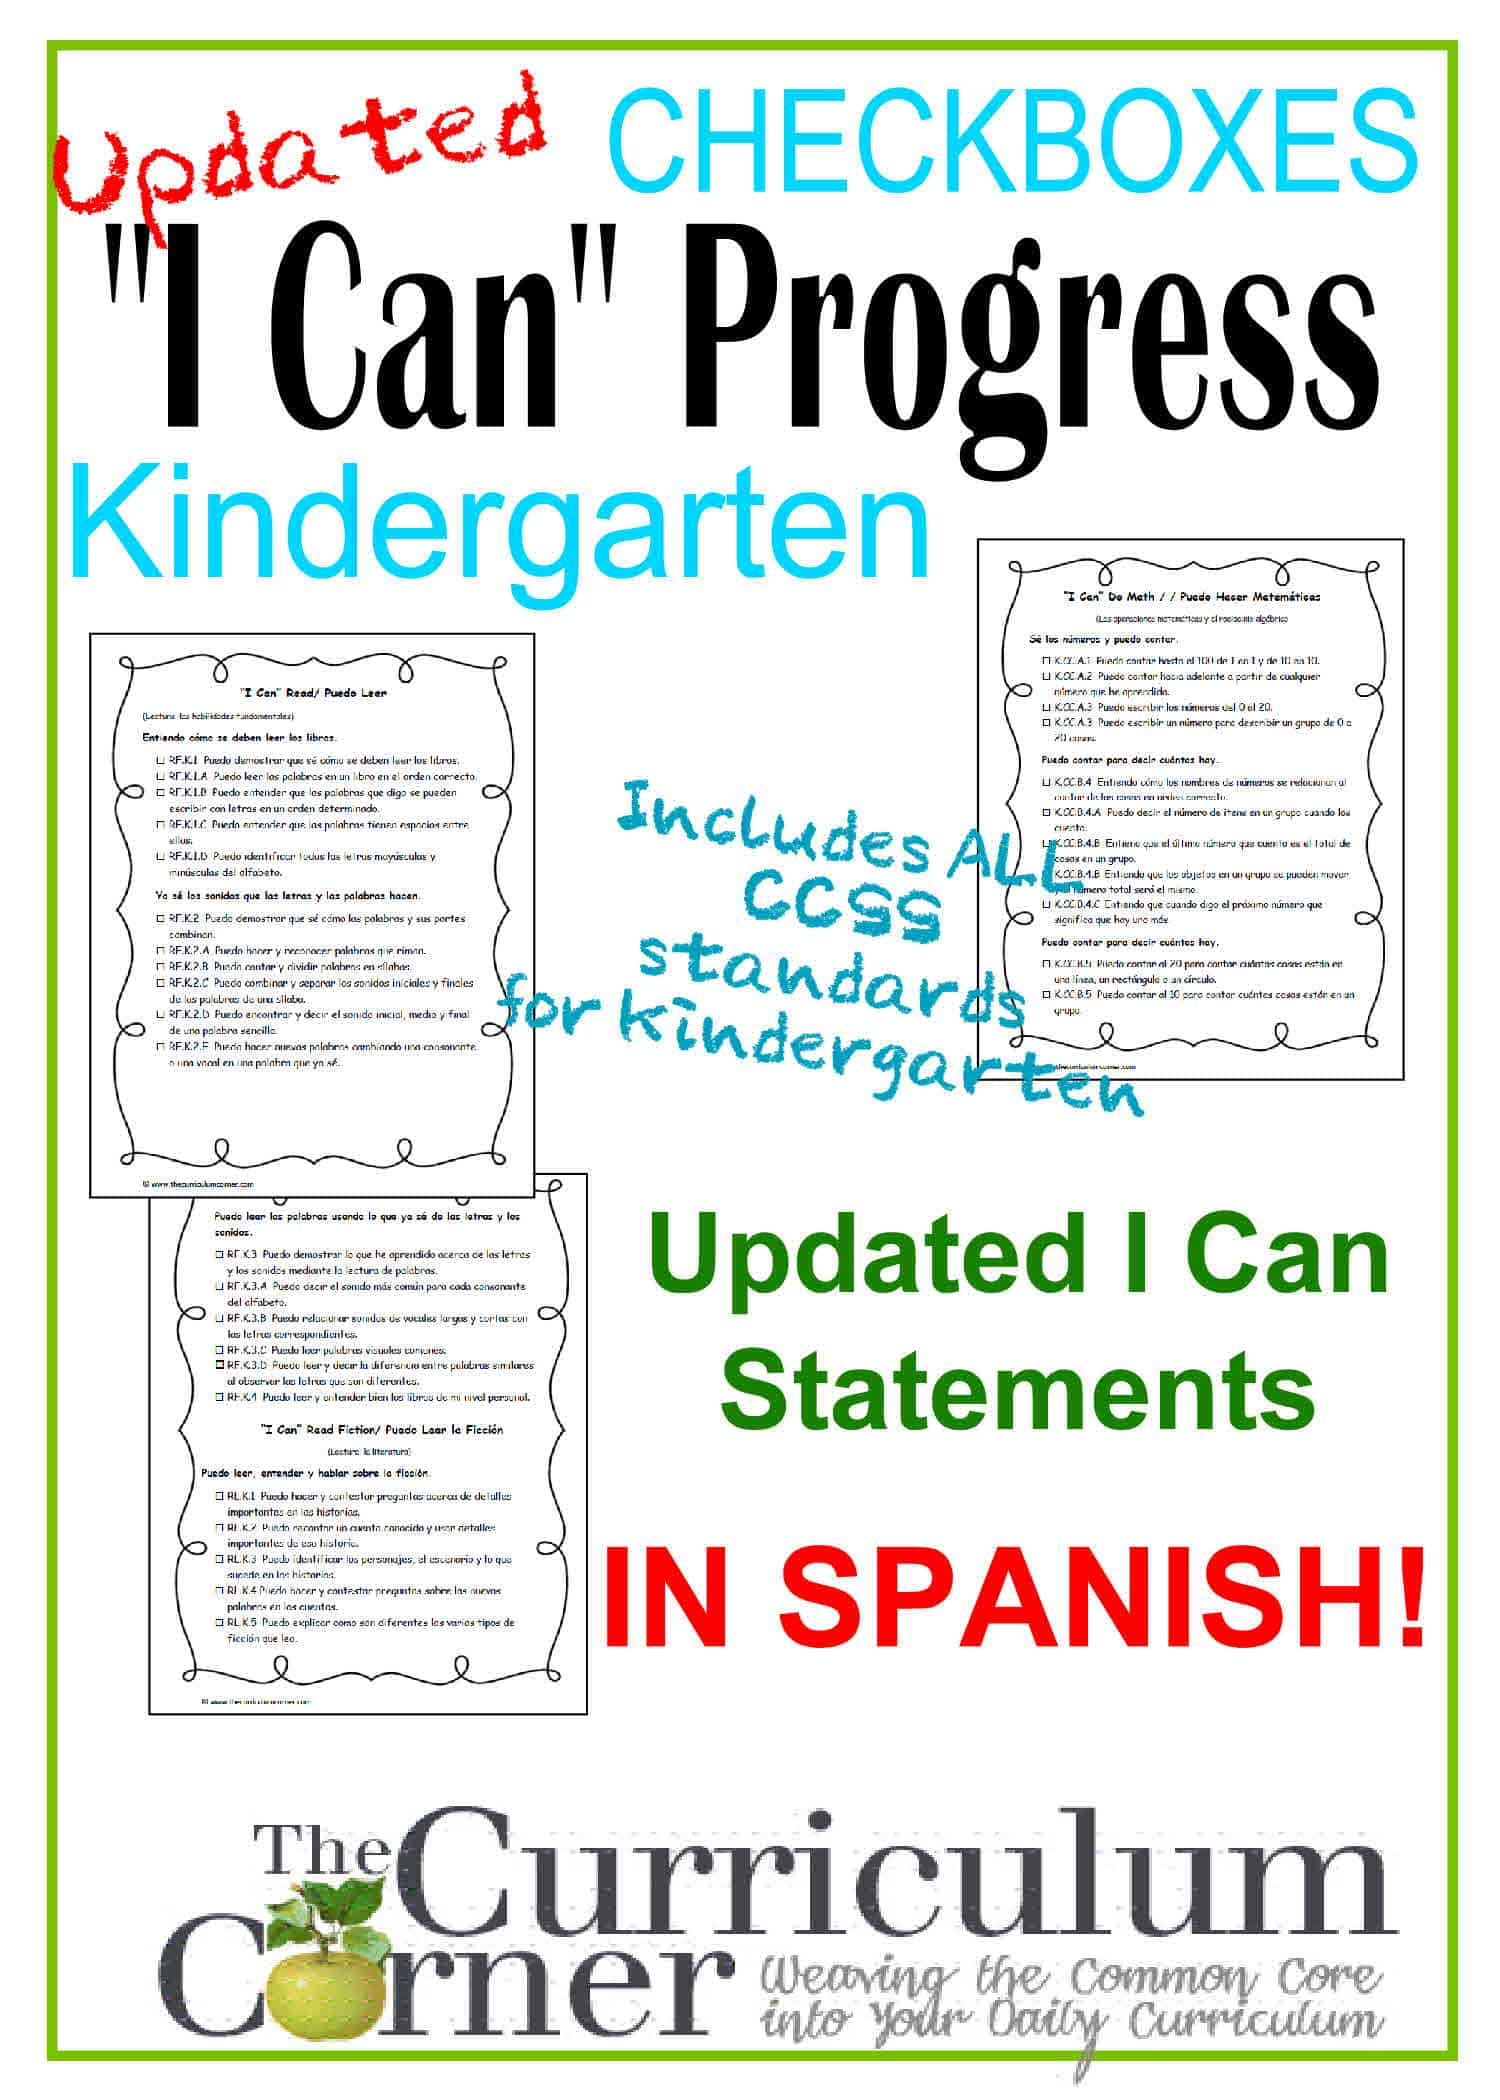 Spanish I Can Common Core Progress Checkboxes